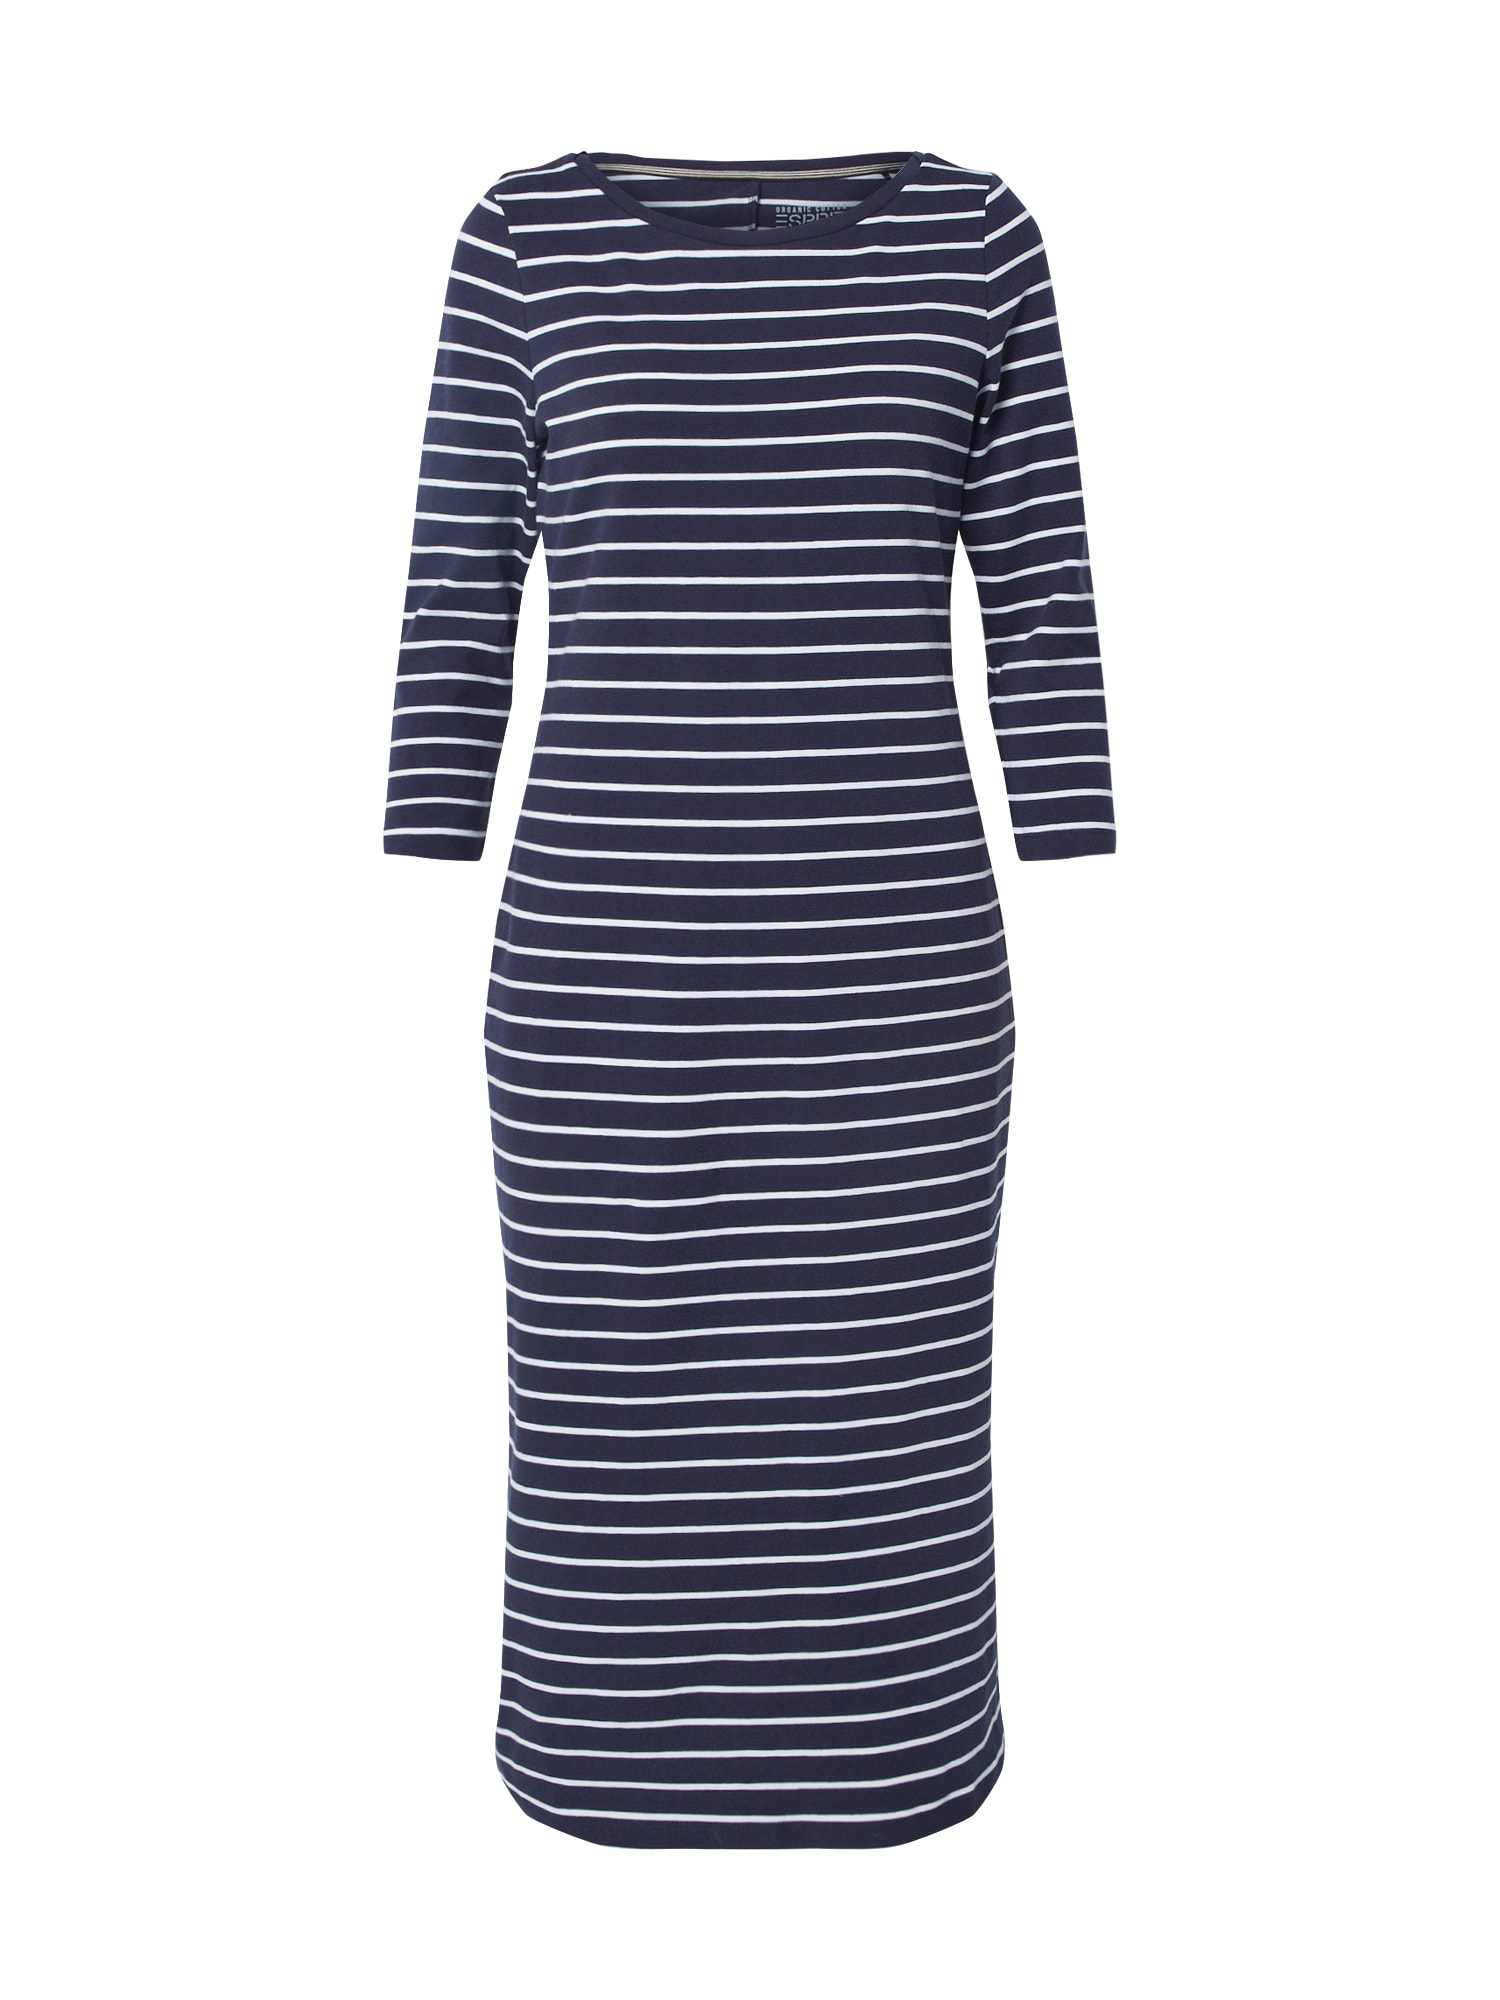 ESPRIT Suknelė 'OCS Scallp' balta / tamsiai mėlyna